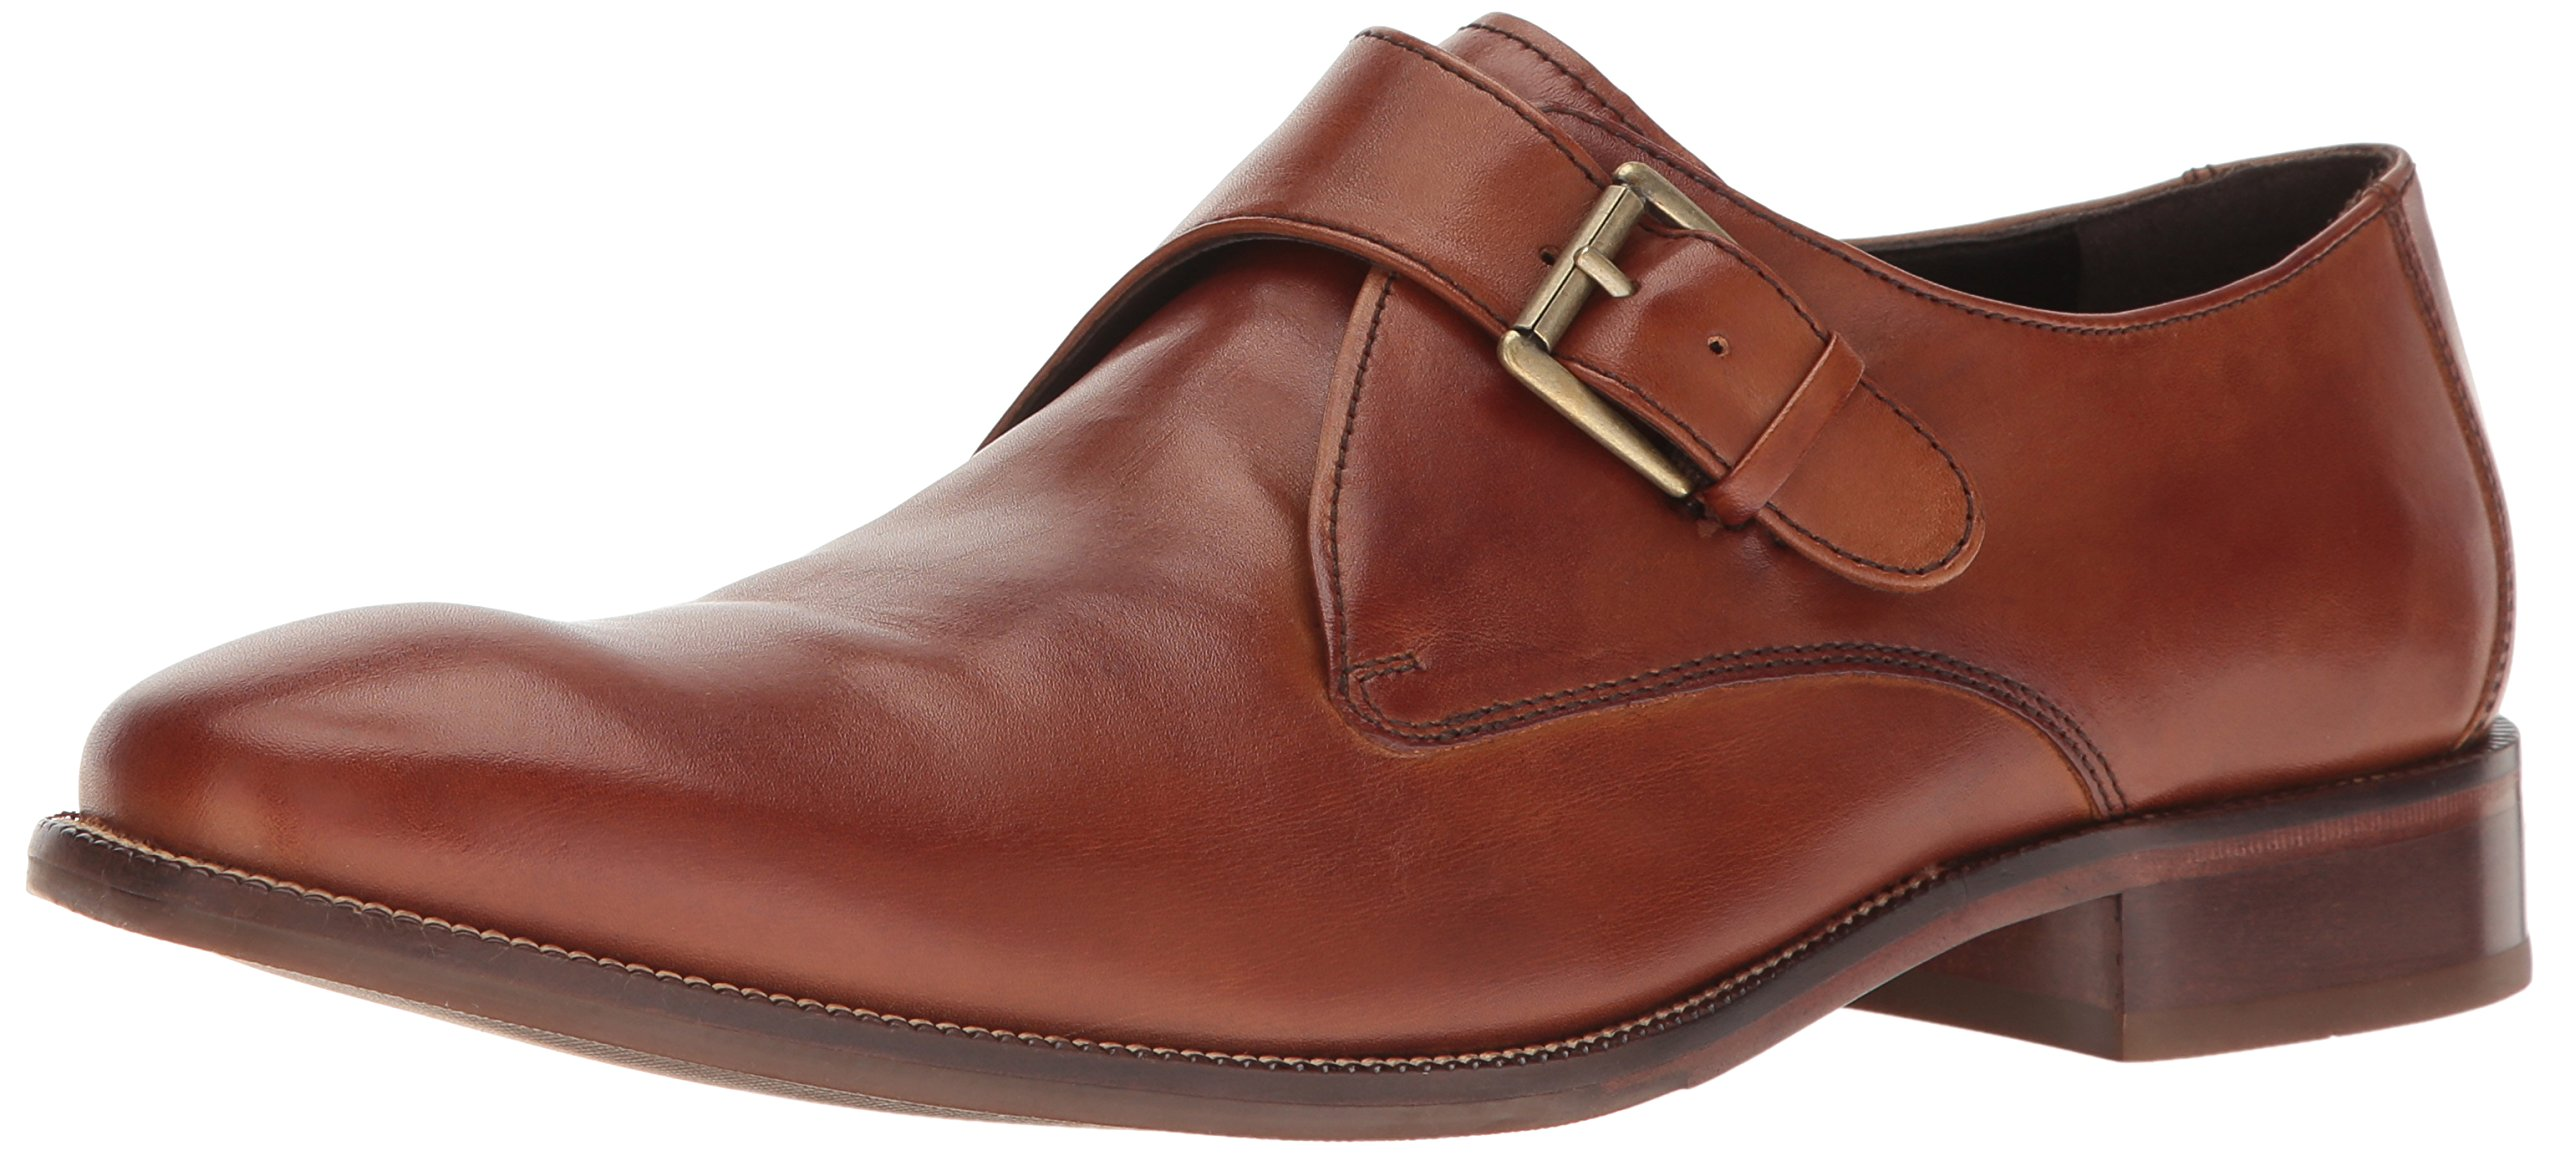 Cole Haan Men's Williams II Monk-Strap Loafer, British tan, 10.5 Medium US